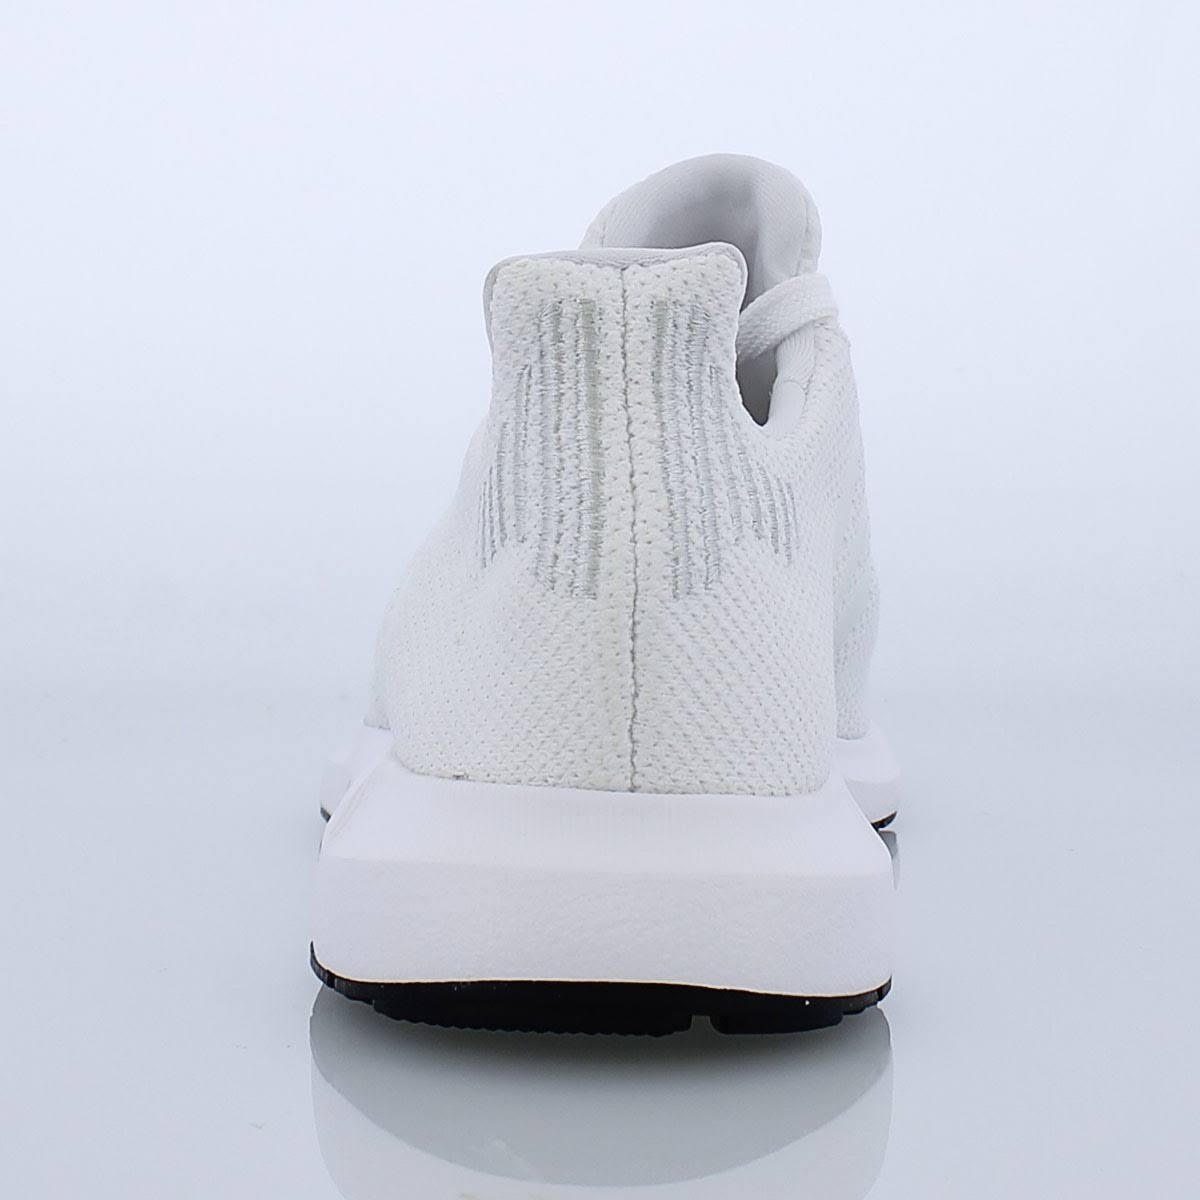 Escolar Calzado Para Adidas Grado De Originals Niños Swift Cm7920100 Run 4Oxp8xPq